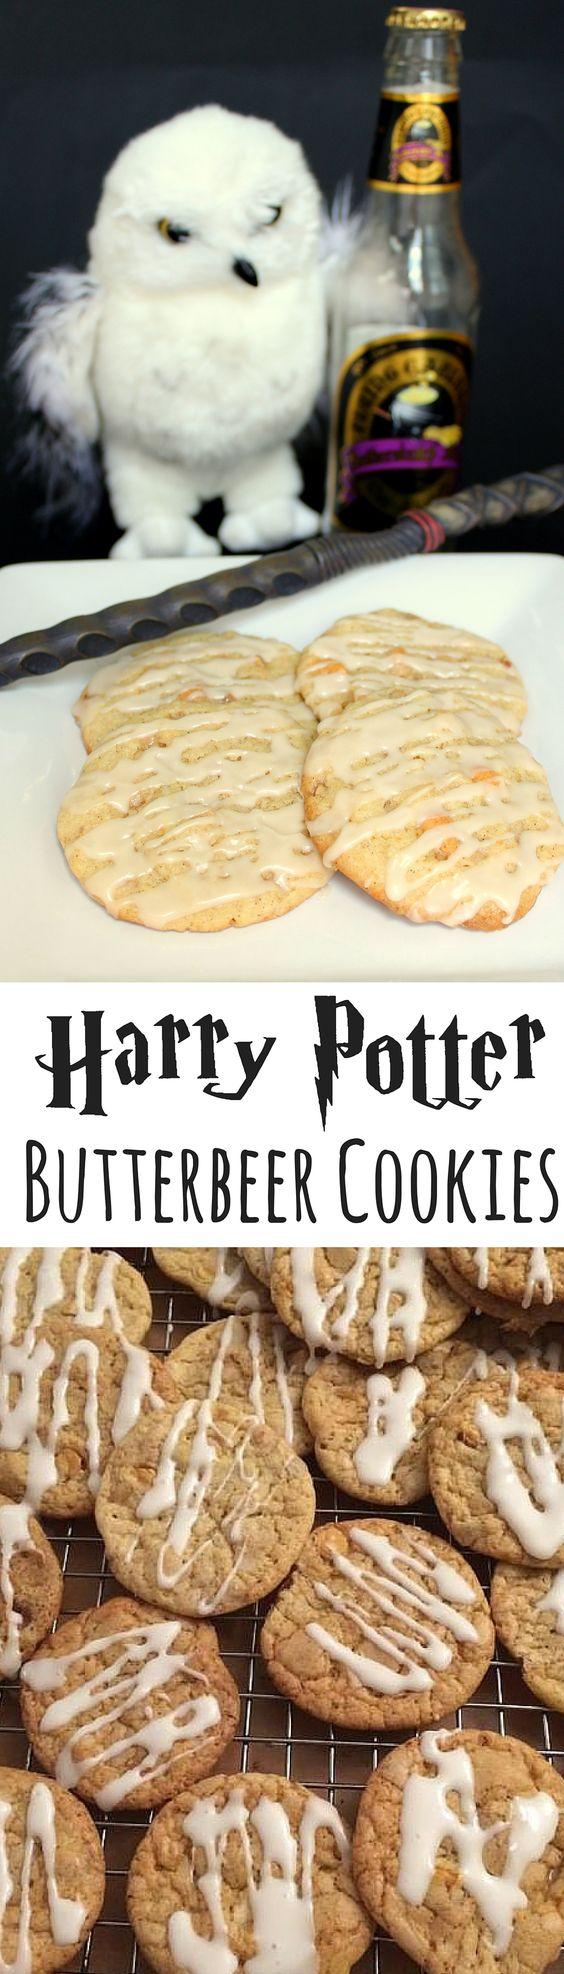 Harry potter sugar cookies recipe